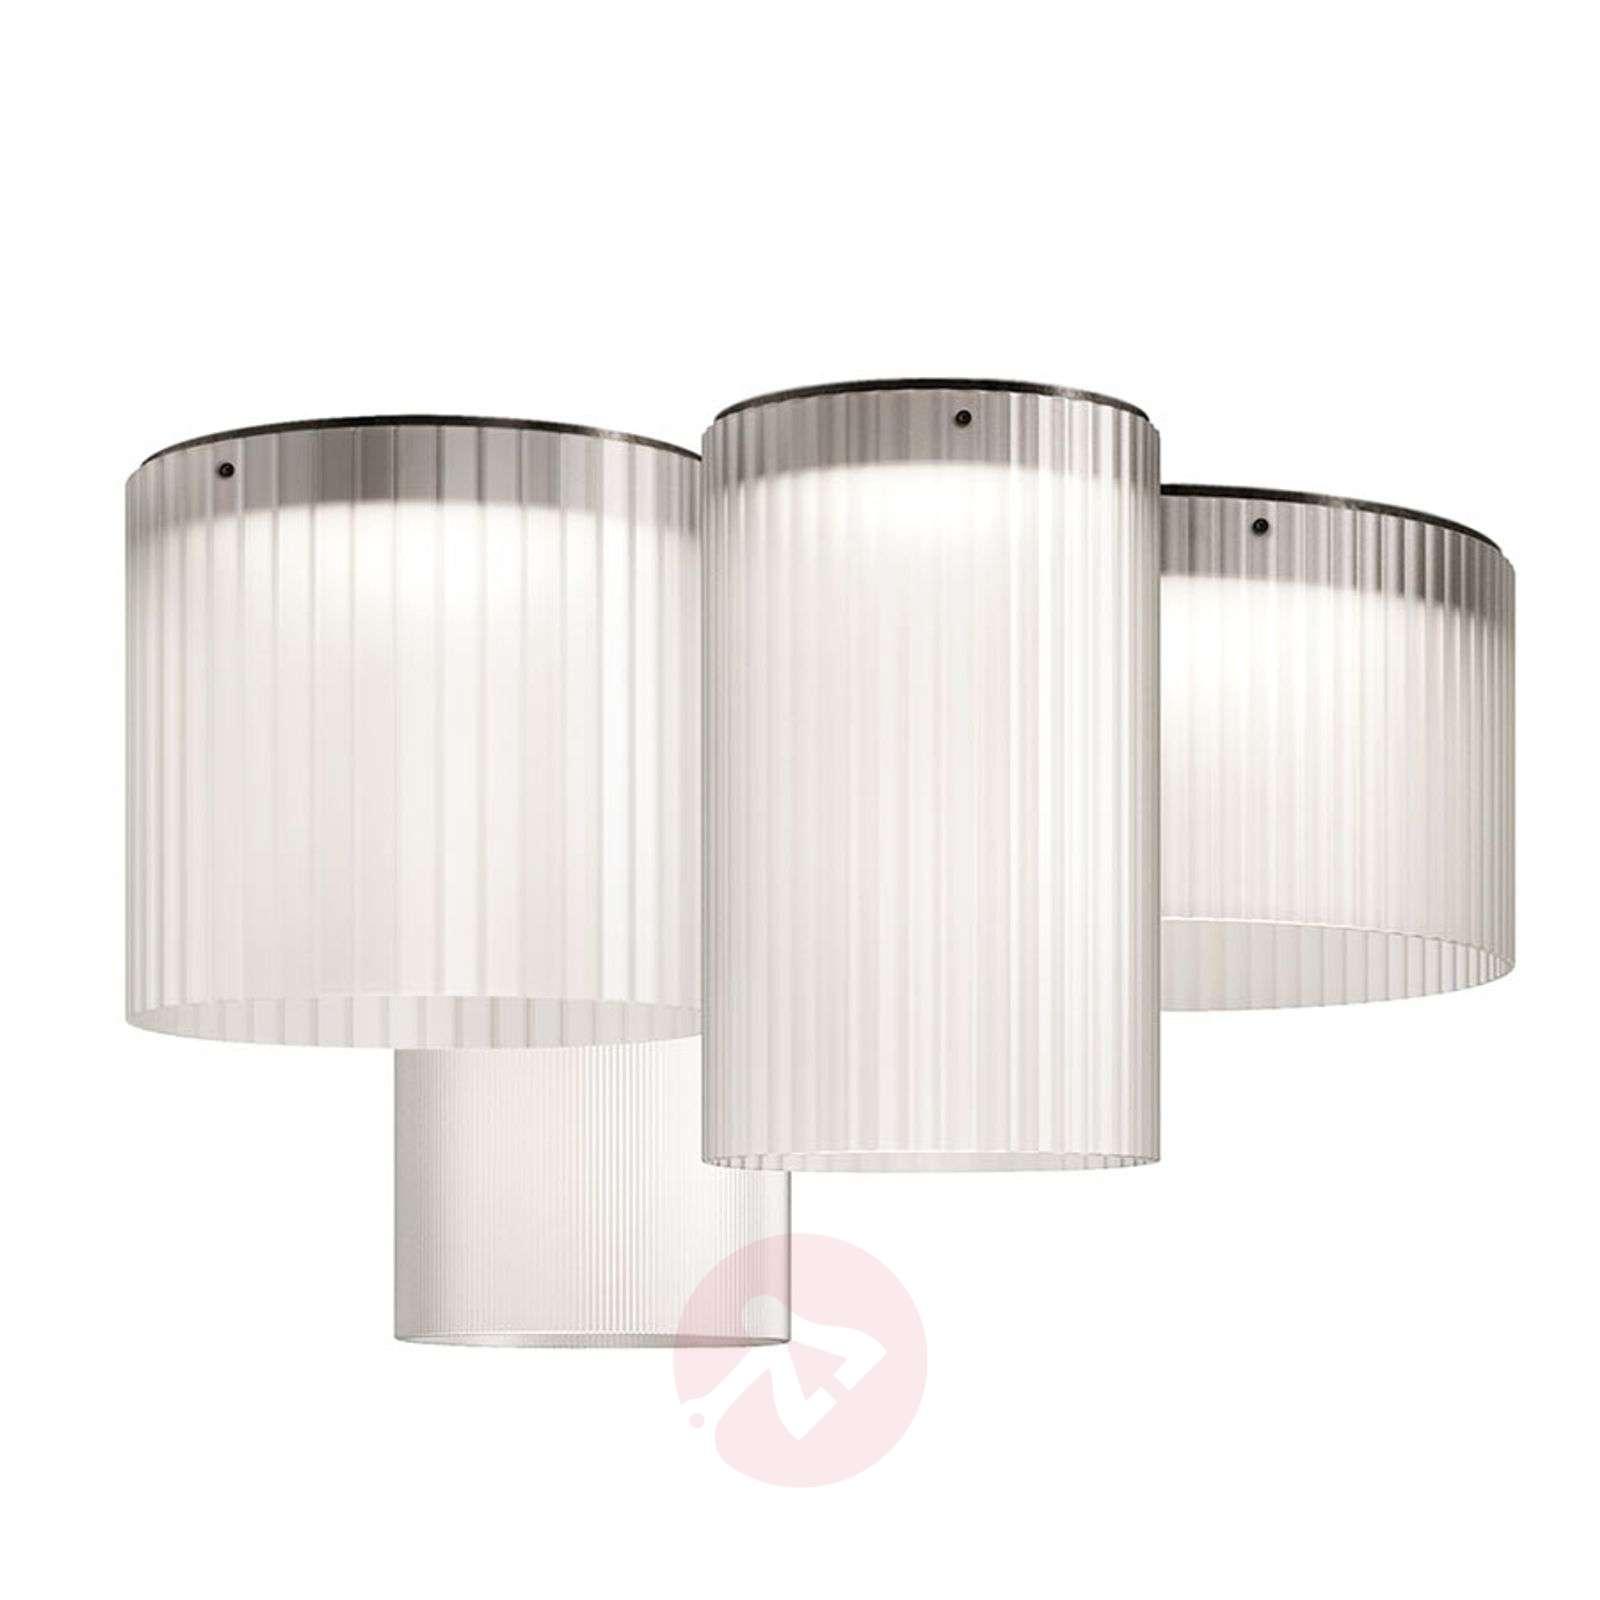 Kundalini Giass LED ceiling light, Ø 40cm-5520223X-01